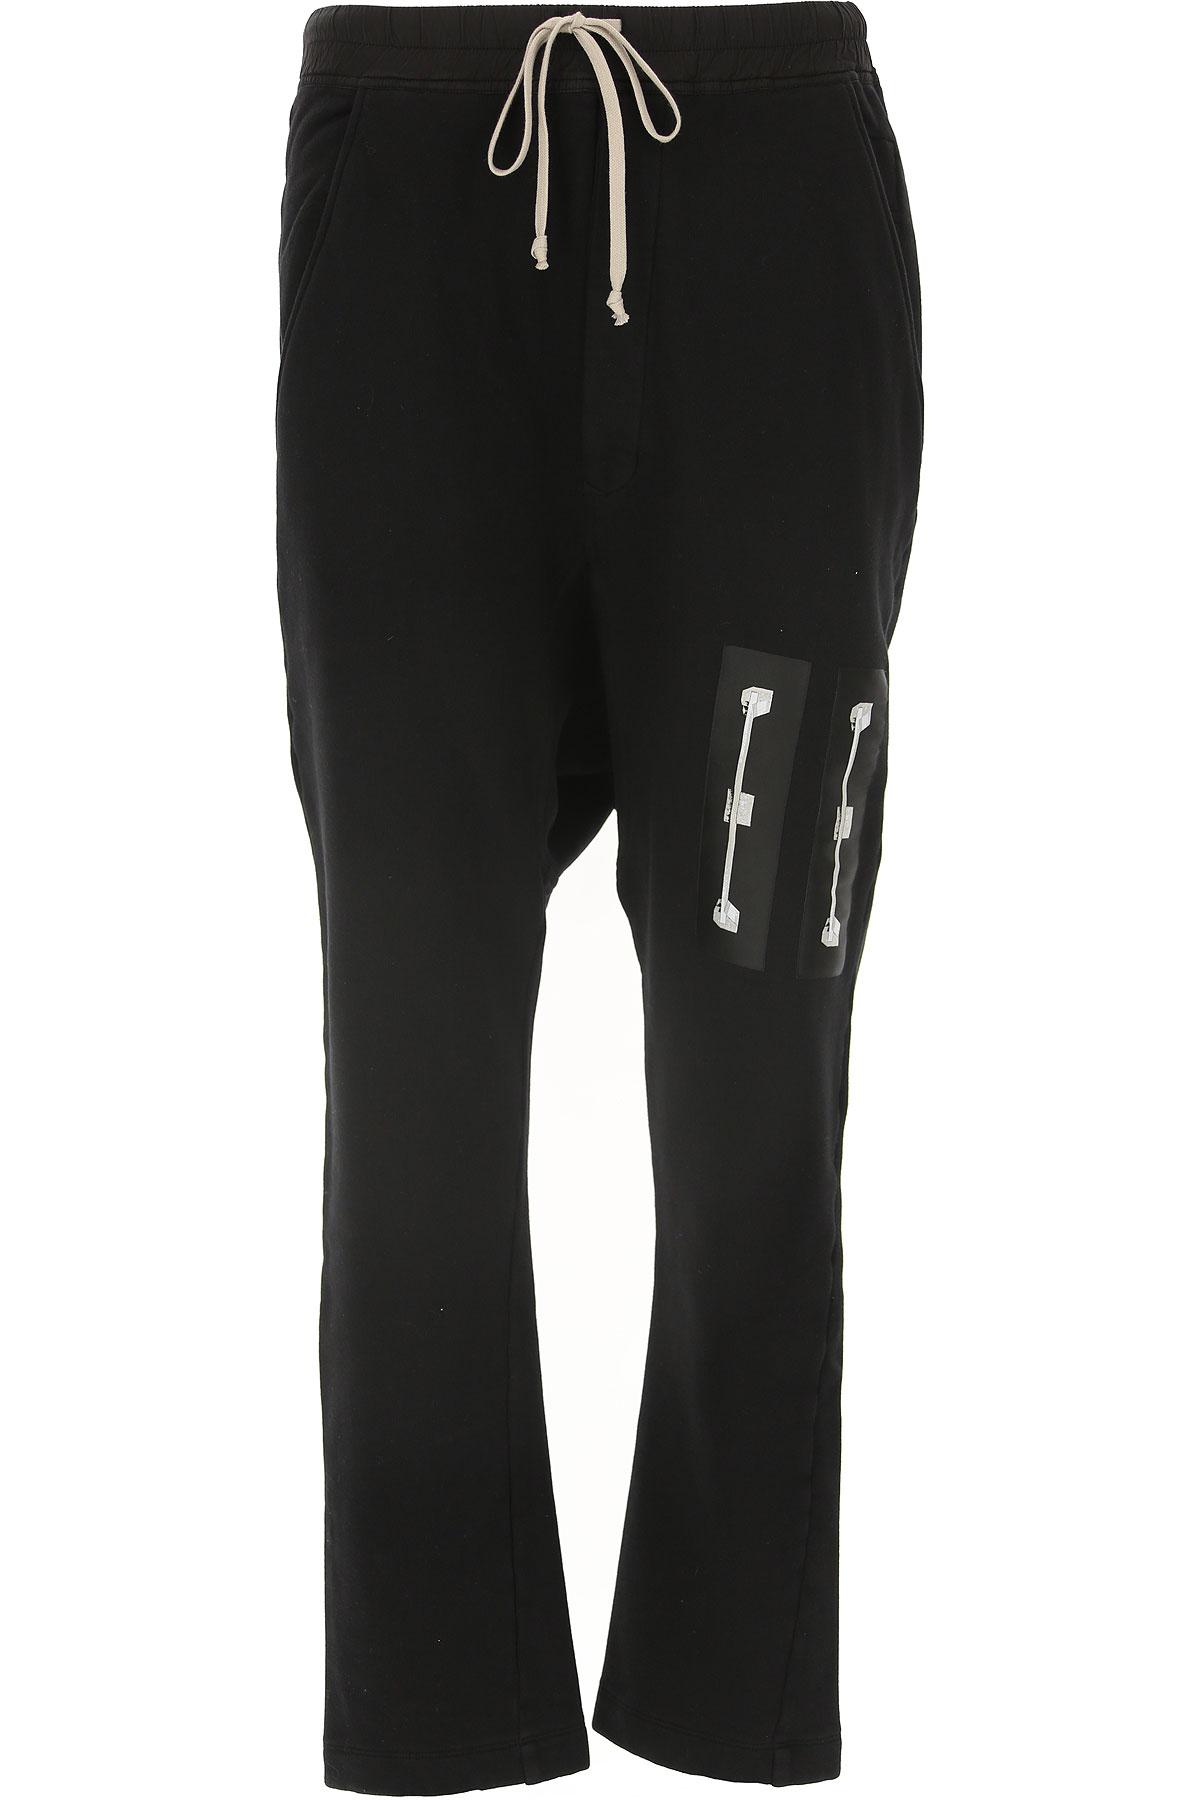 Rick Owens Pants for Men On Sale in Outlet, Black, Cotton, 2019, 30 32